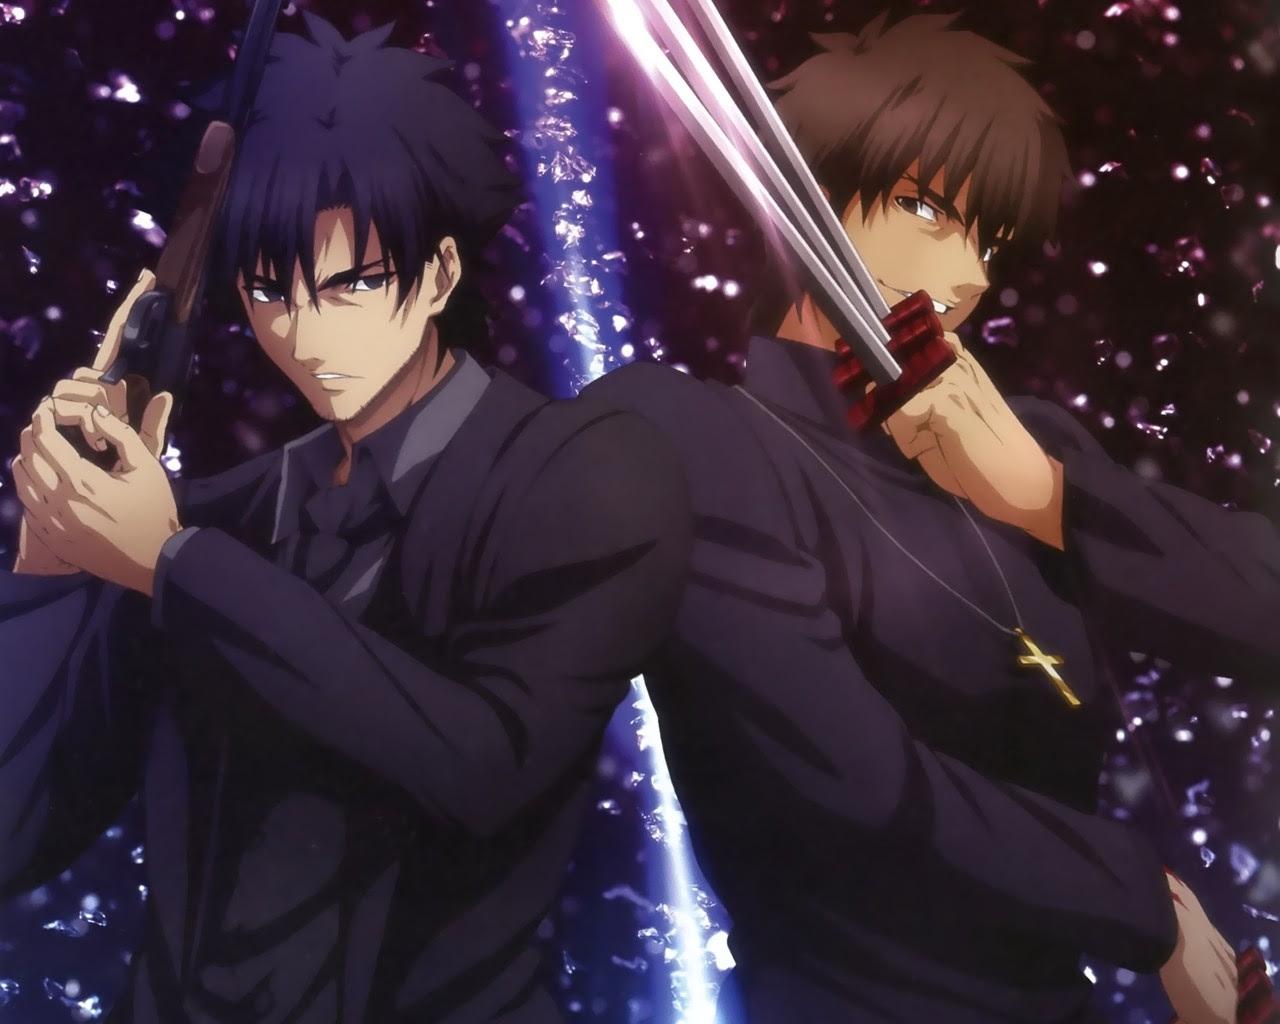 Fate Zero 壁紙 1280x1024 壁紙 Pc用壁紙 アニメ画像 サイズ